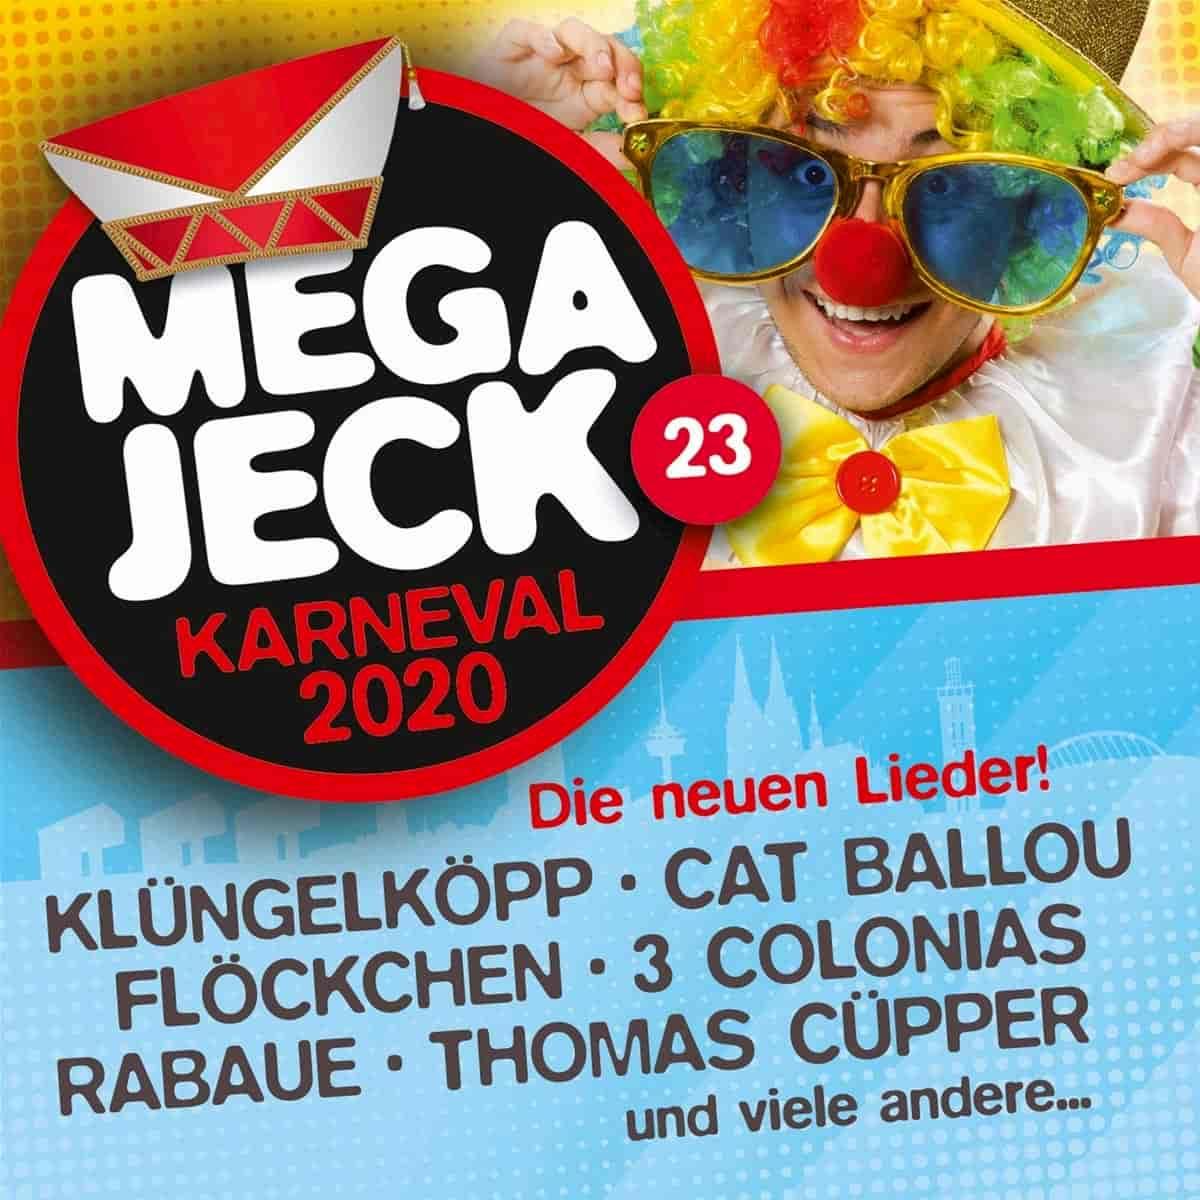 Megajeck 23 - Neue Karnevals-Lieder der Session 2019-2020